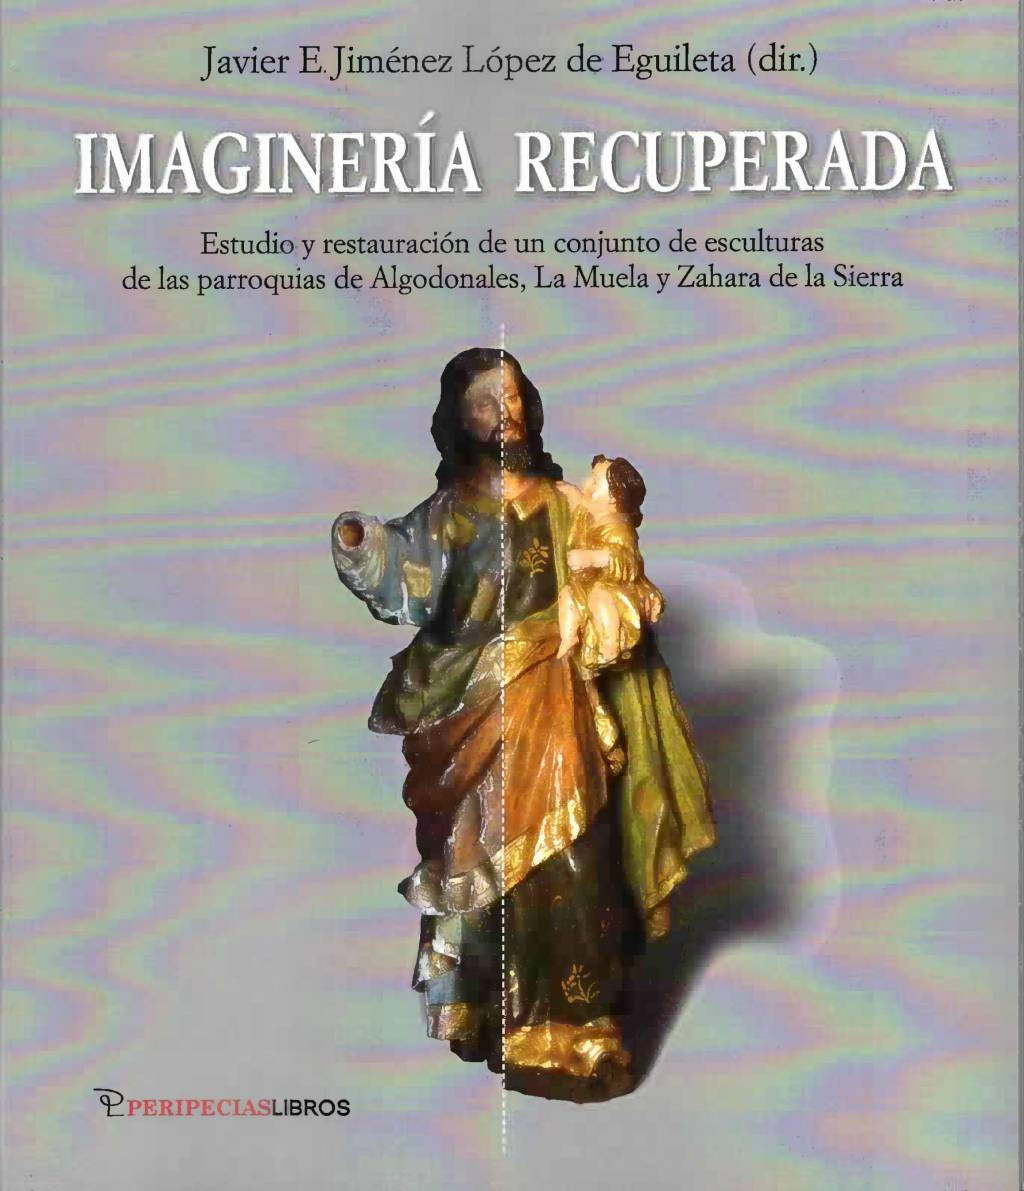 Imaginería recuperada. Javier E. Jiménez López de Eguileta